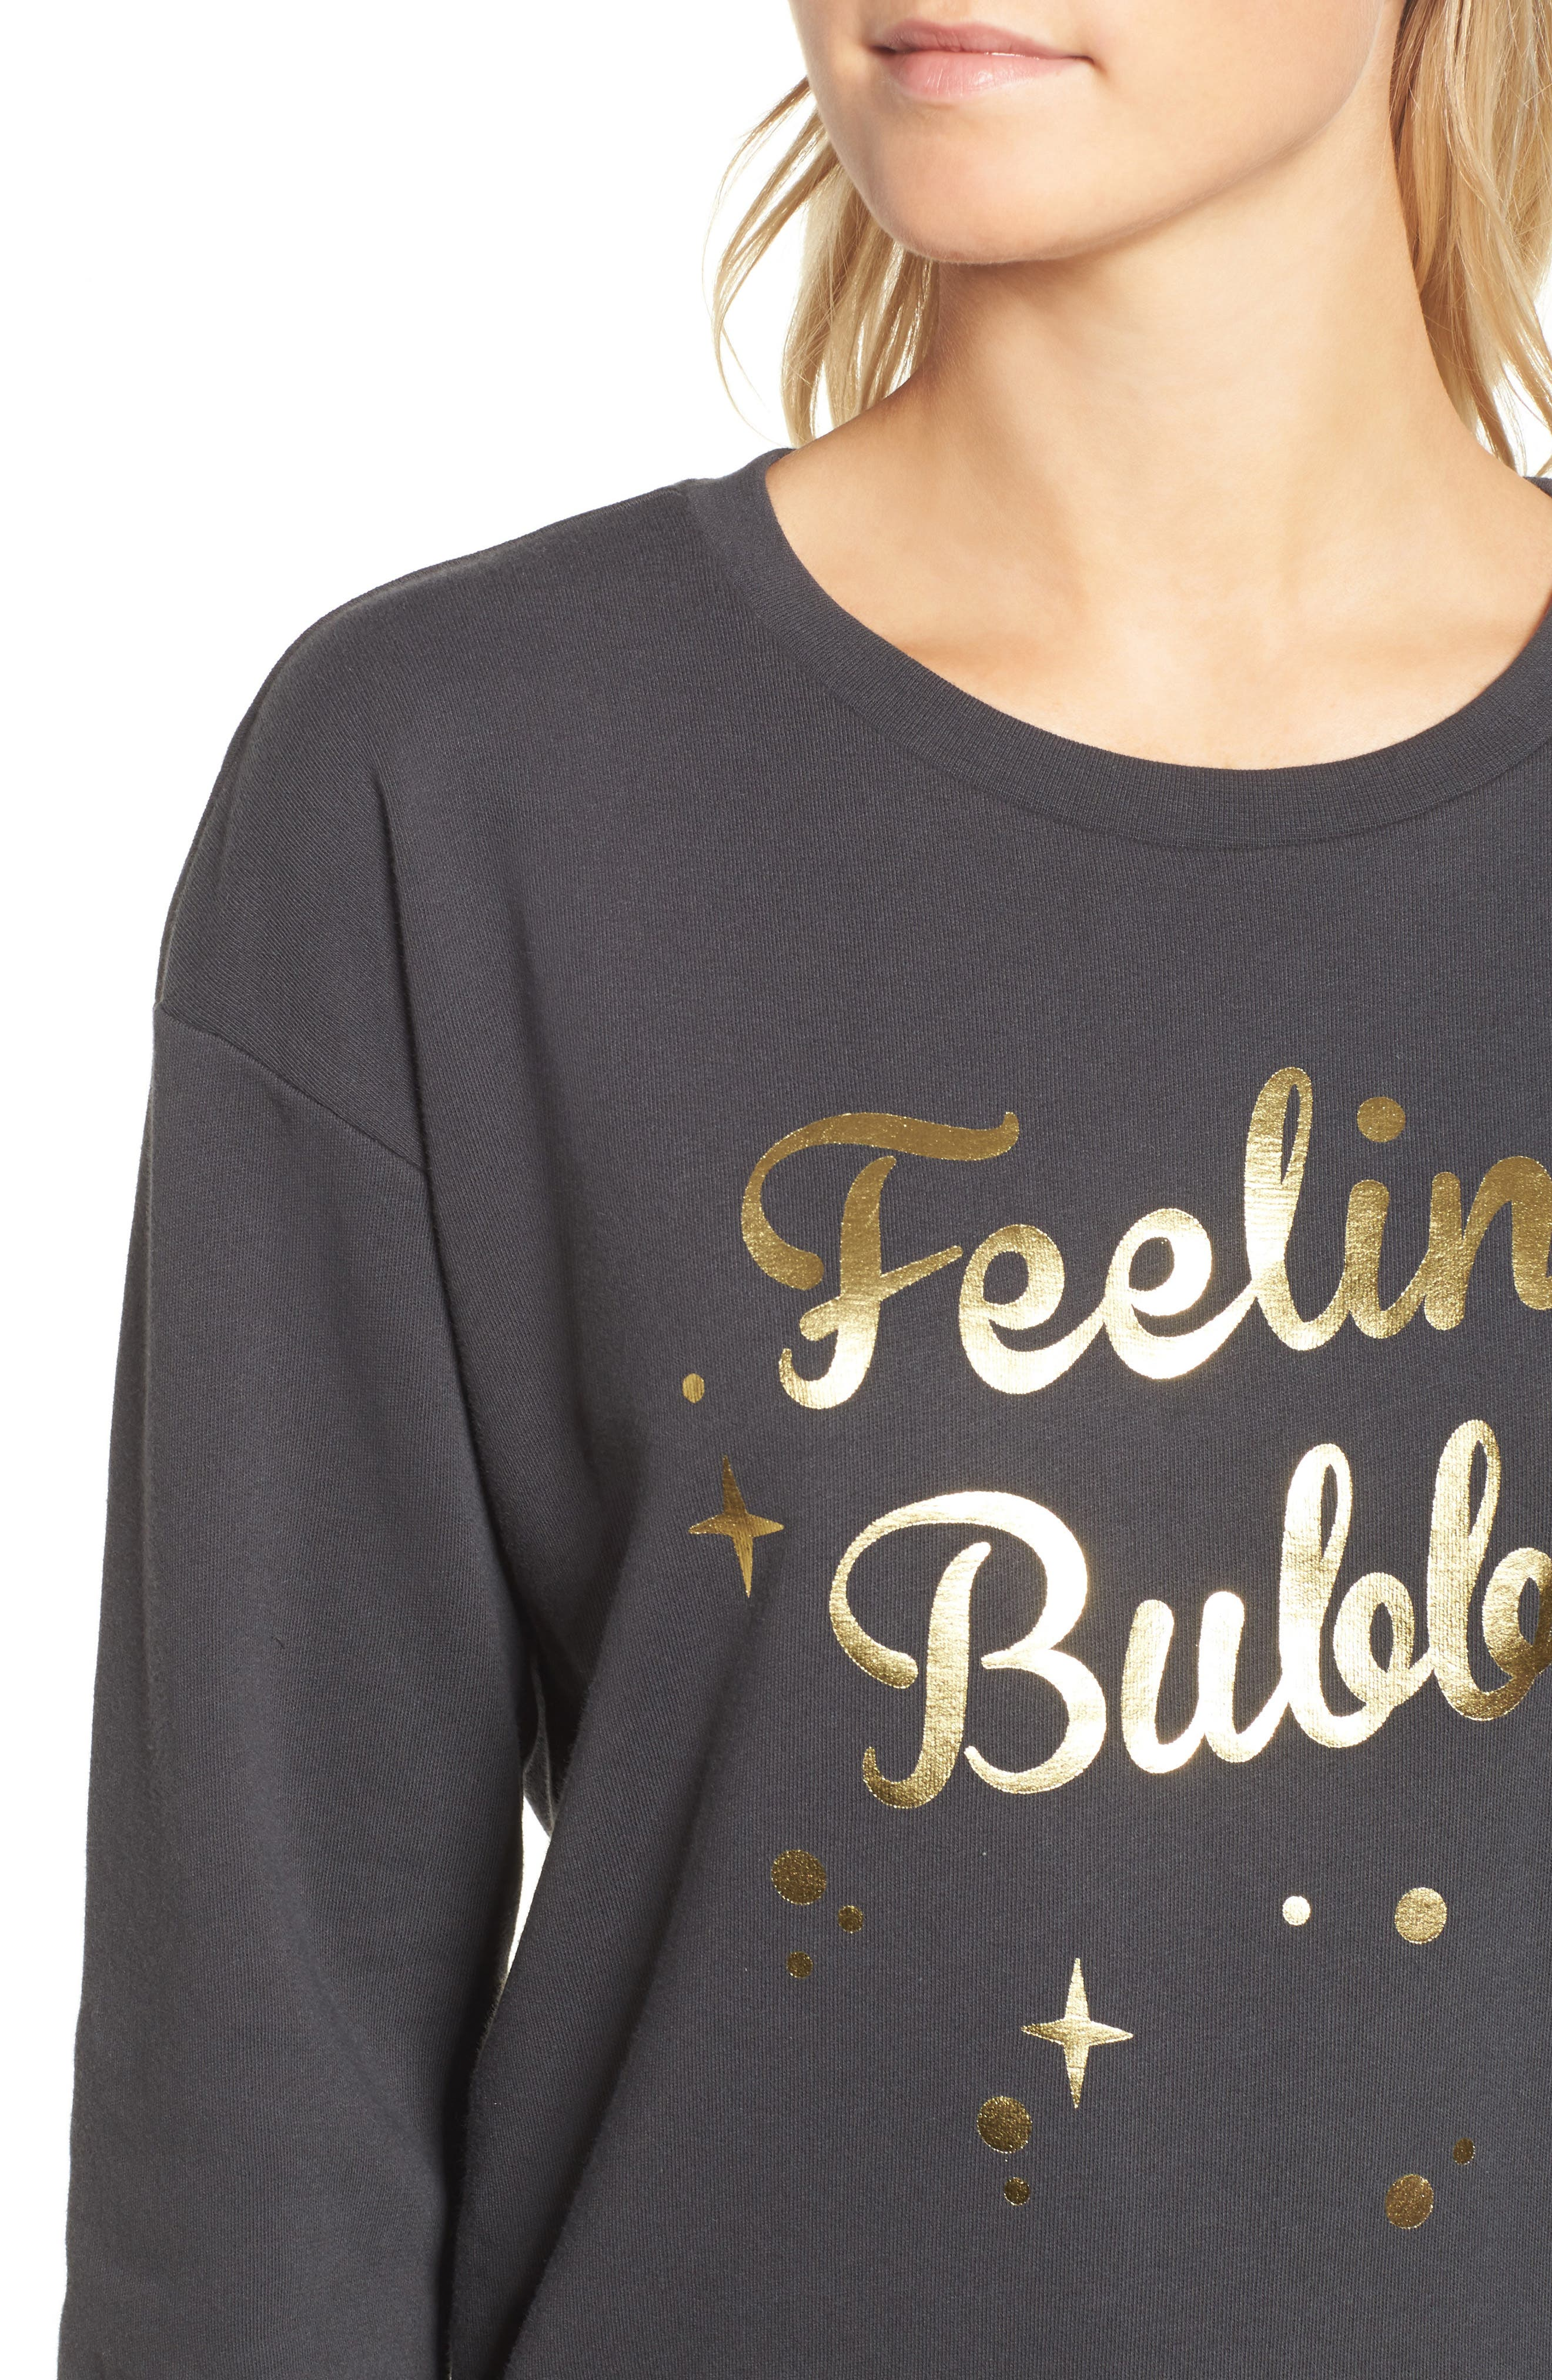 Feeling Bubbly Sweatshirt,                             Alternate thumbnail 4, color,                             001